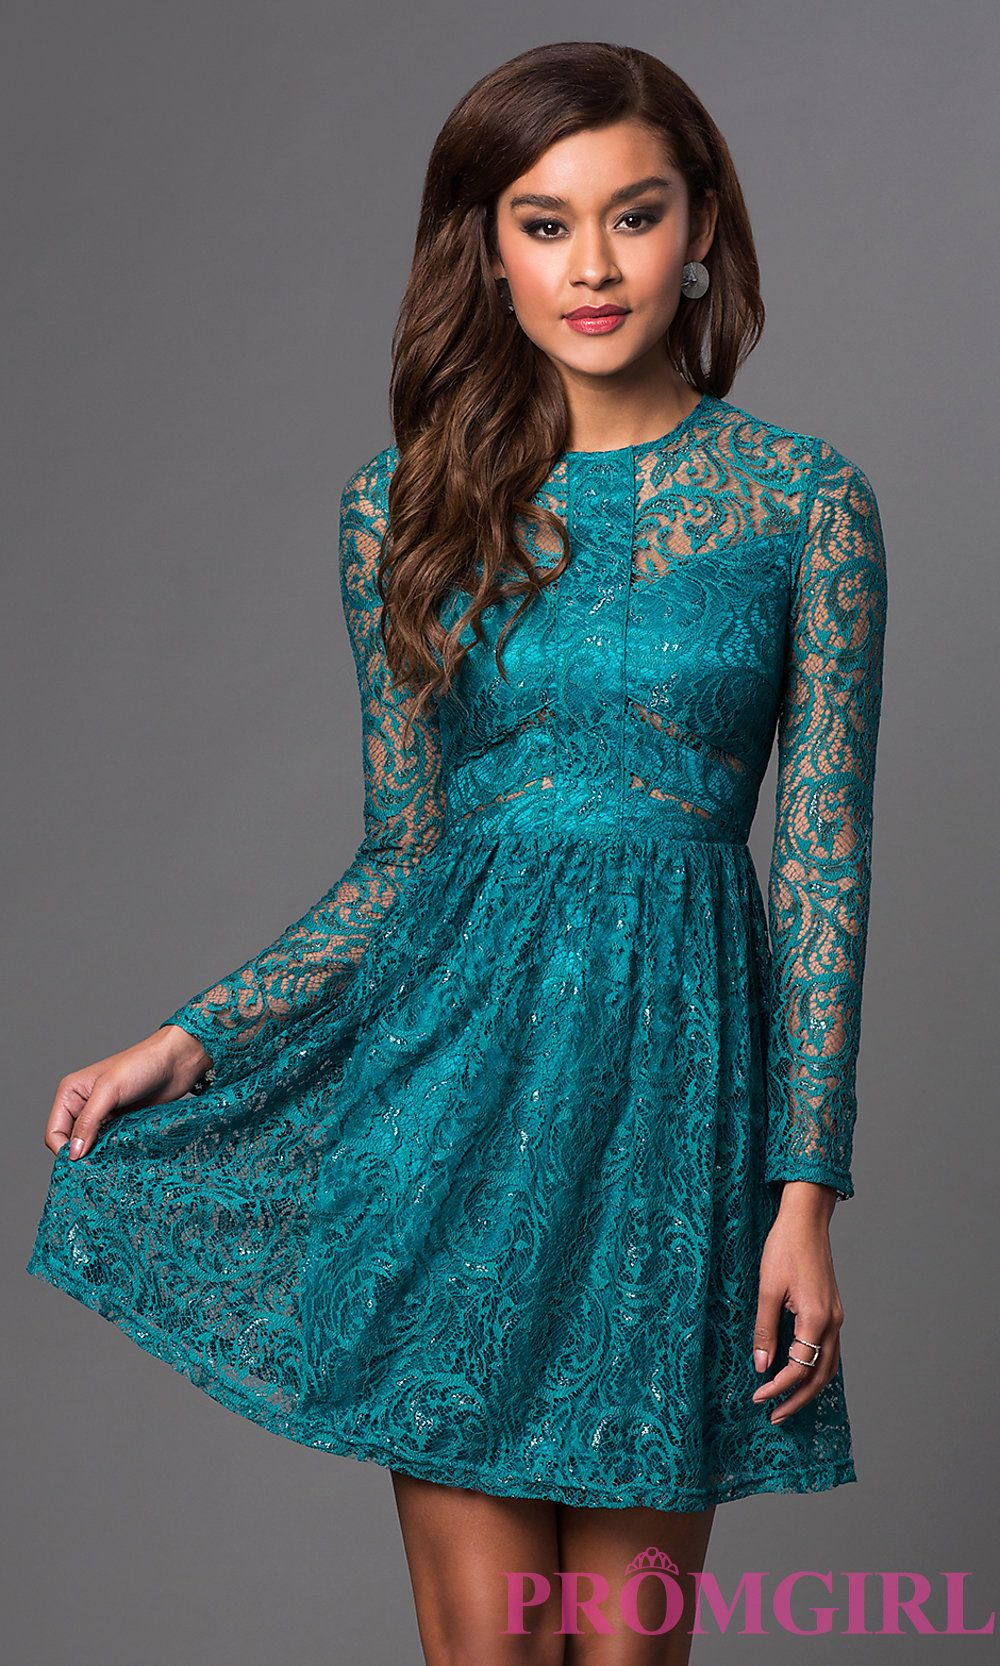 Casual short wedding dresses with long sleeves? - Weddingbee | Long ...